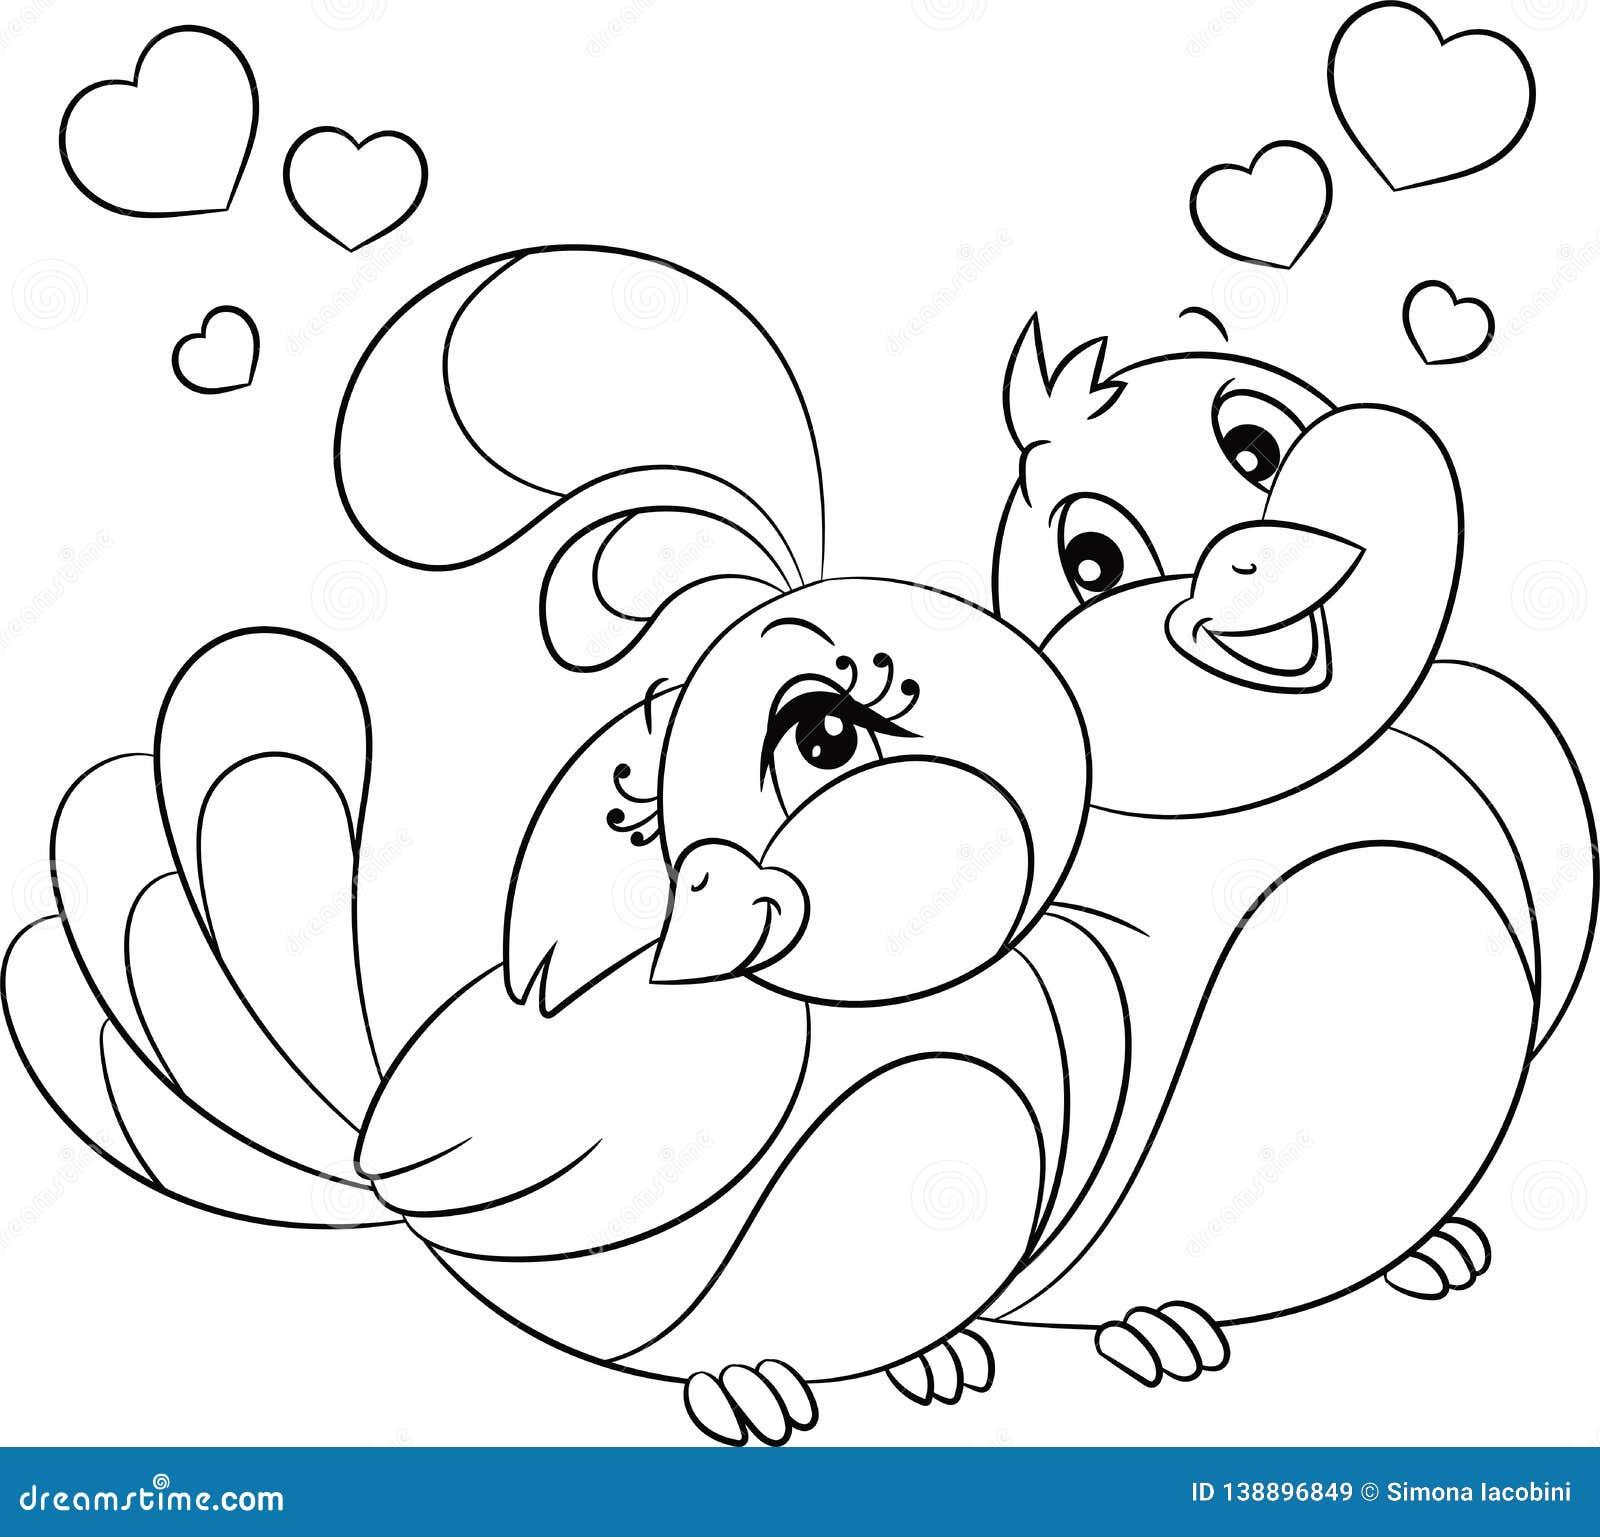 Black and white kawaii illustration of a bird couple